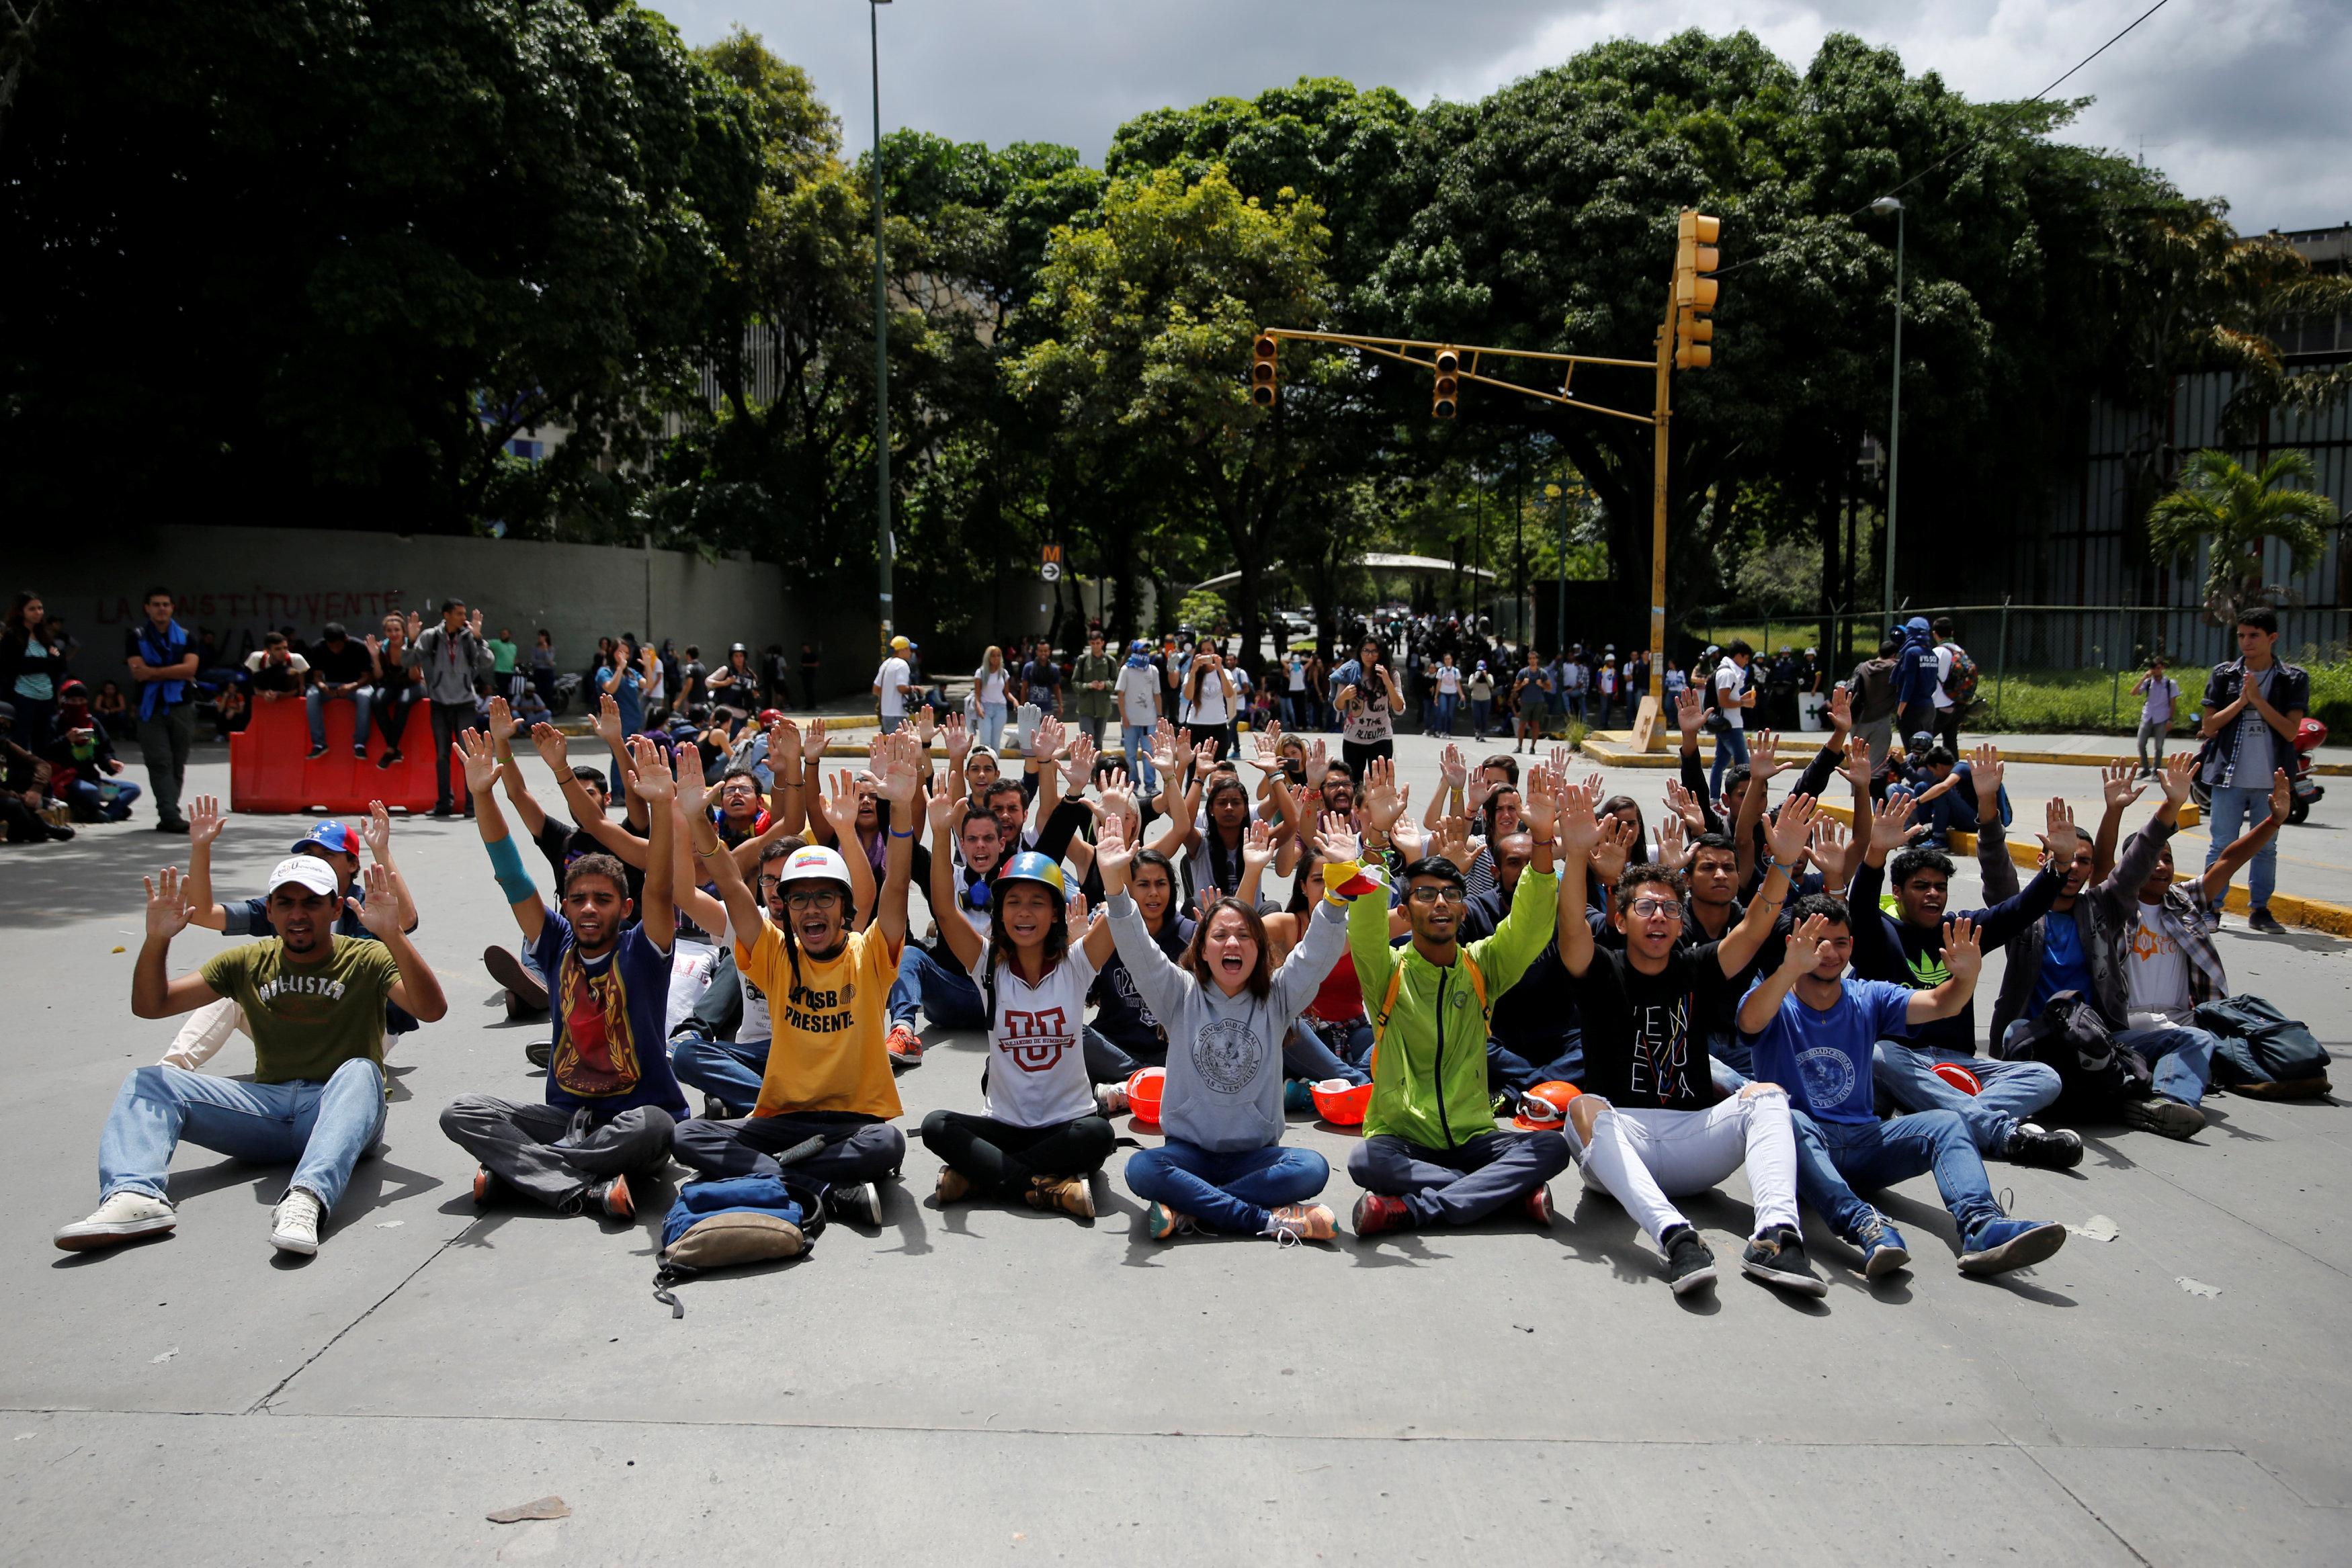 Opposition supporters block a street during a rally against Venezuela's President Nicolas Maduro's Government in Caracas, Venezuela, June 30, 2017. REUTERS/Ivan Alvarado